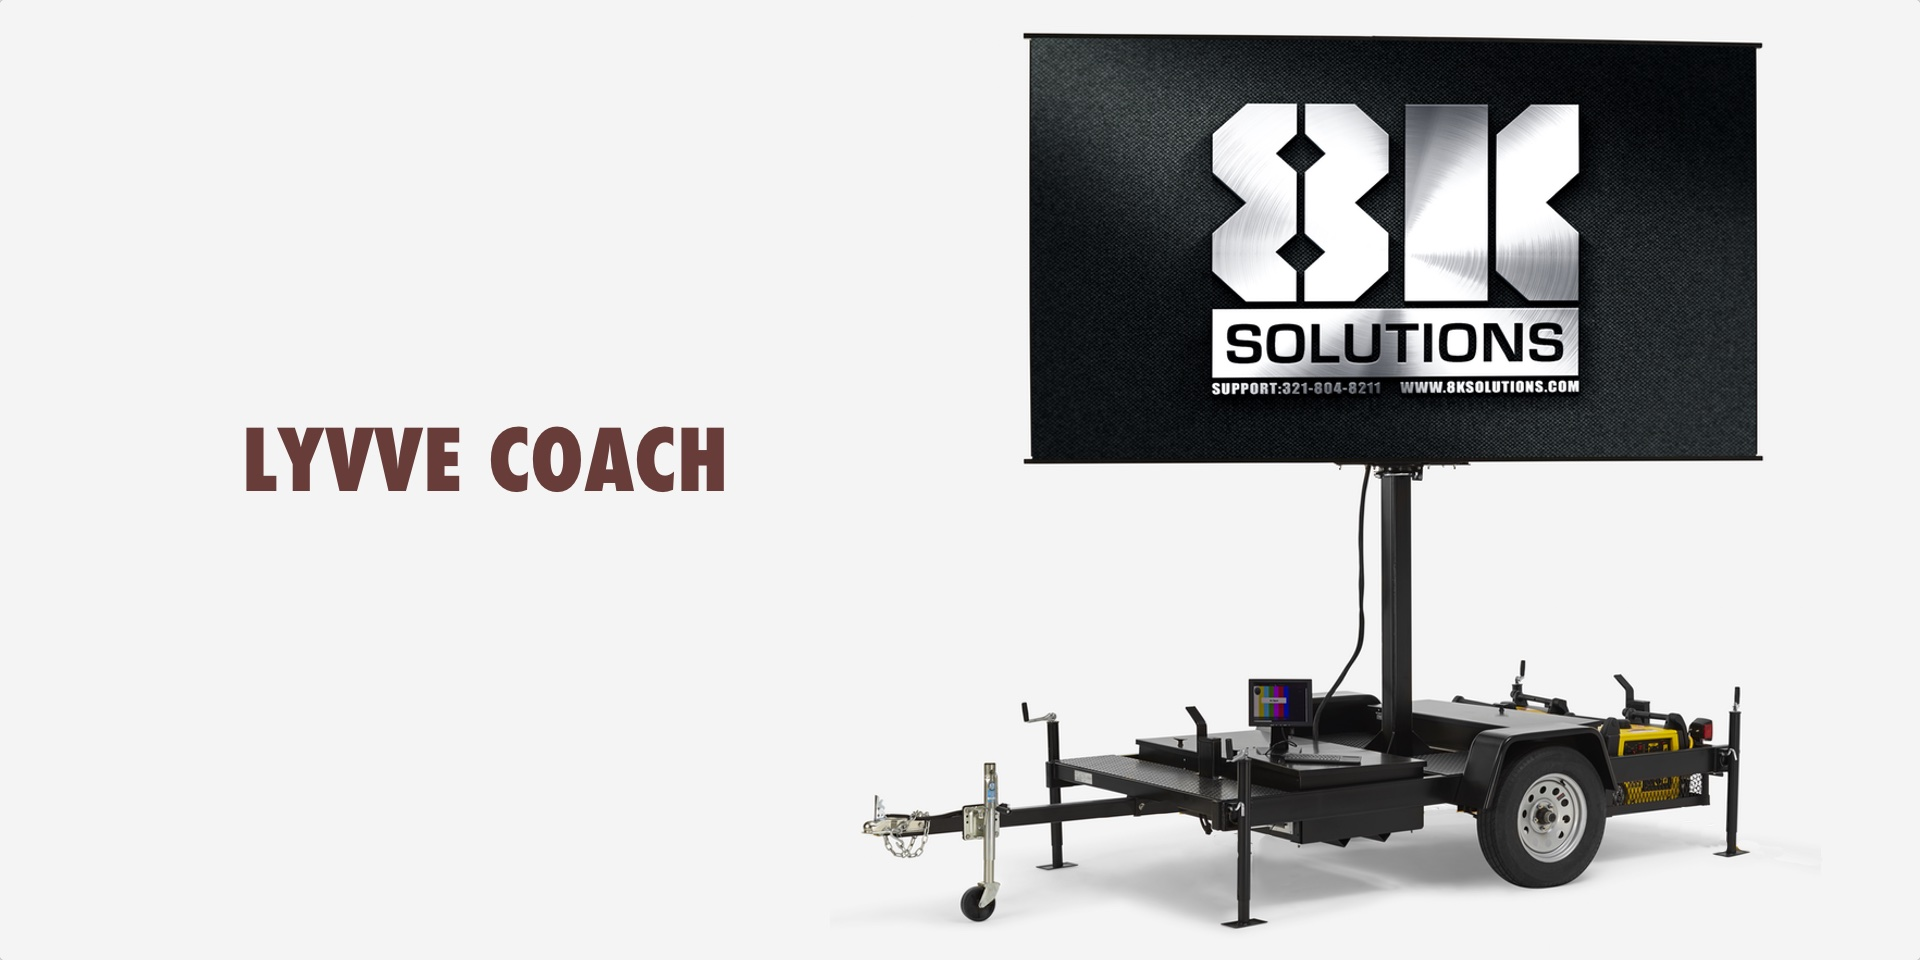 8K_Solutions_Lyvve_Coach_Web.jpg